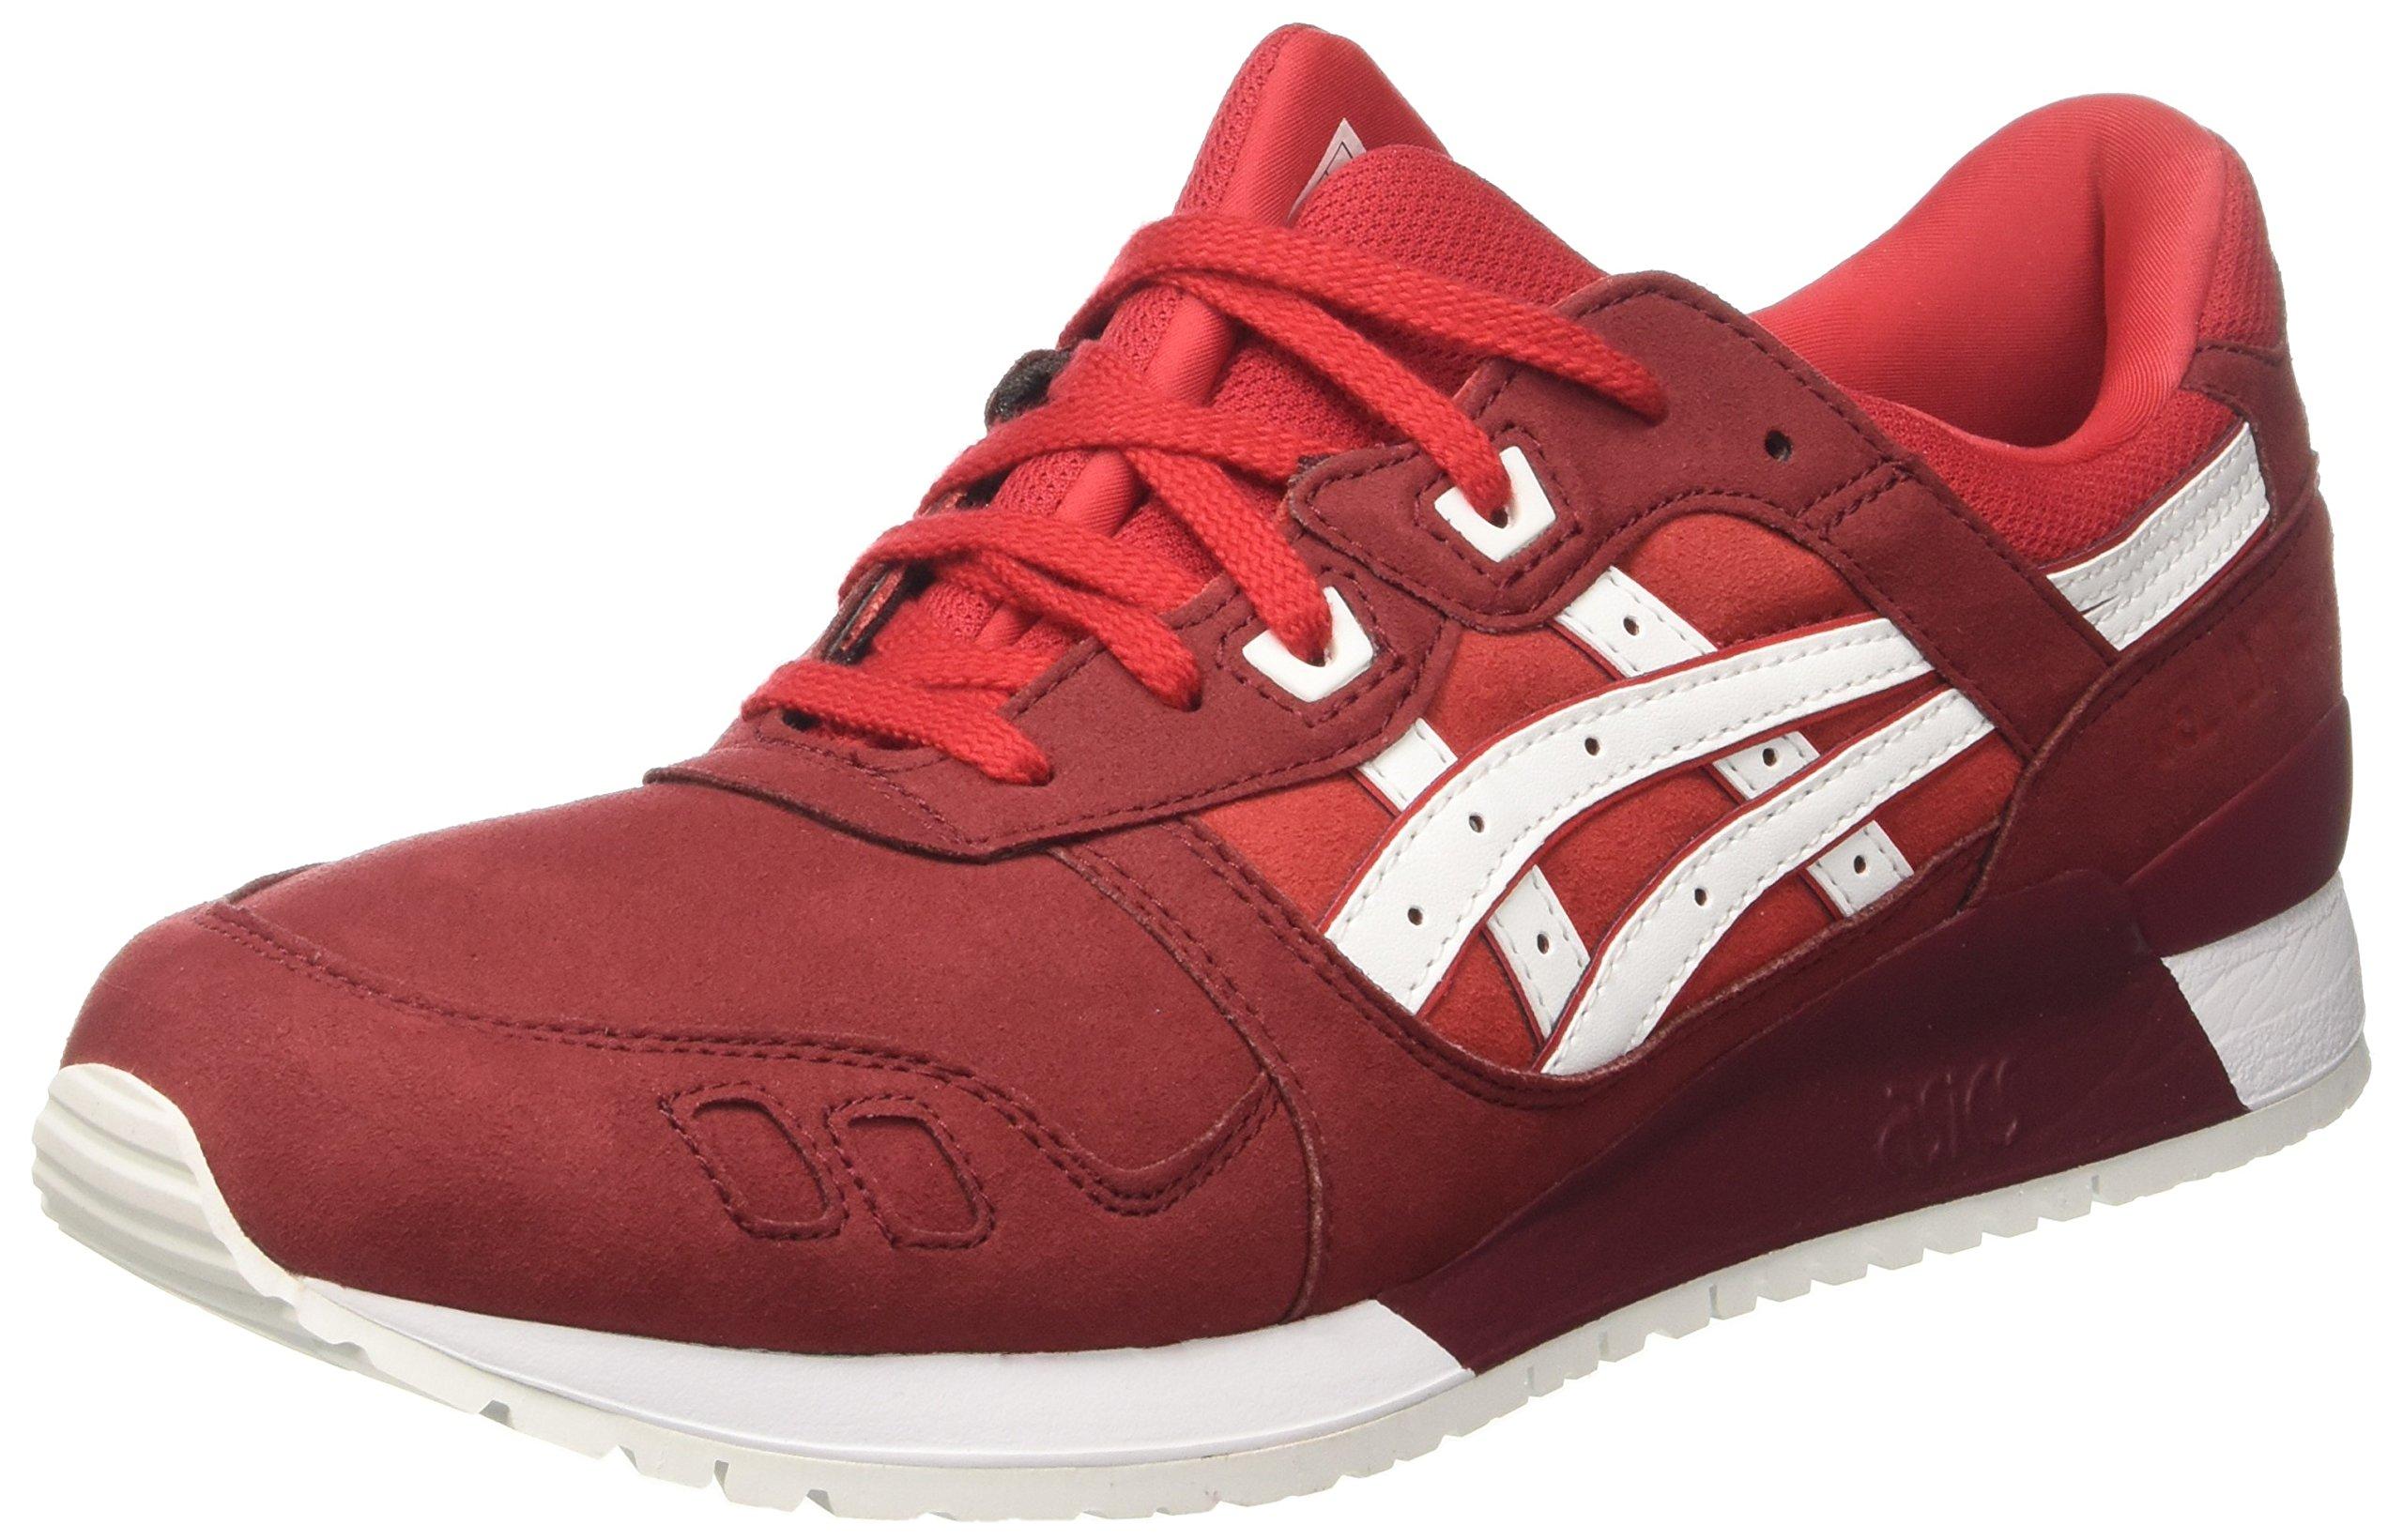 H7k4y Gel 2301Sneakers Iii 5 Asics Basses Eu HommeRougered46 Lyte iZlXwPkuTO